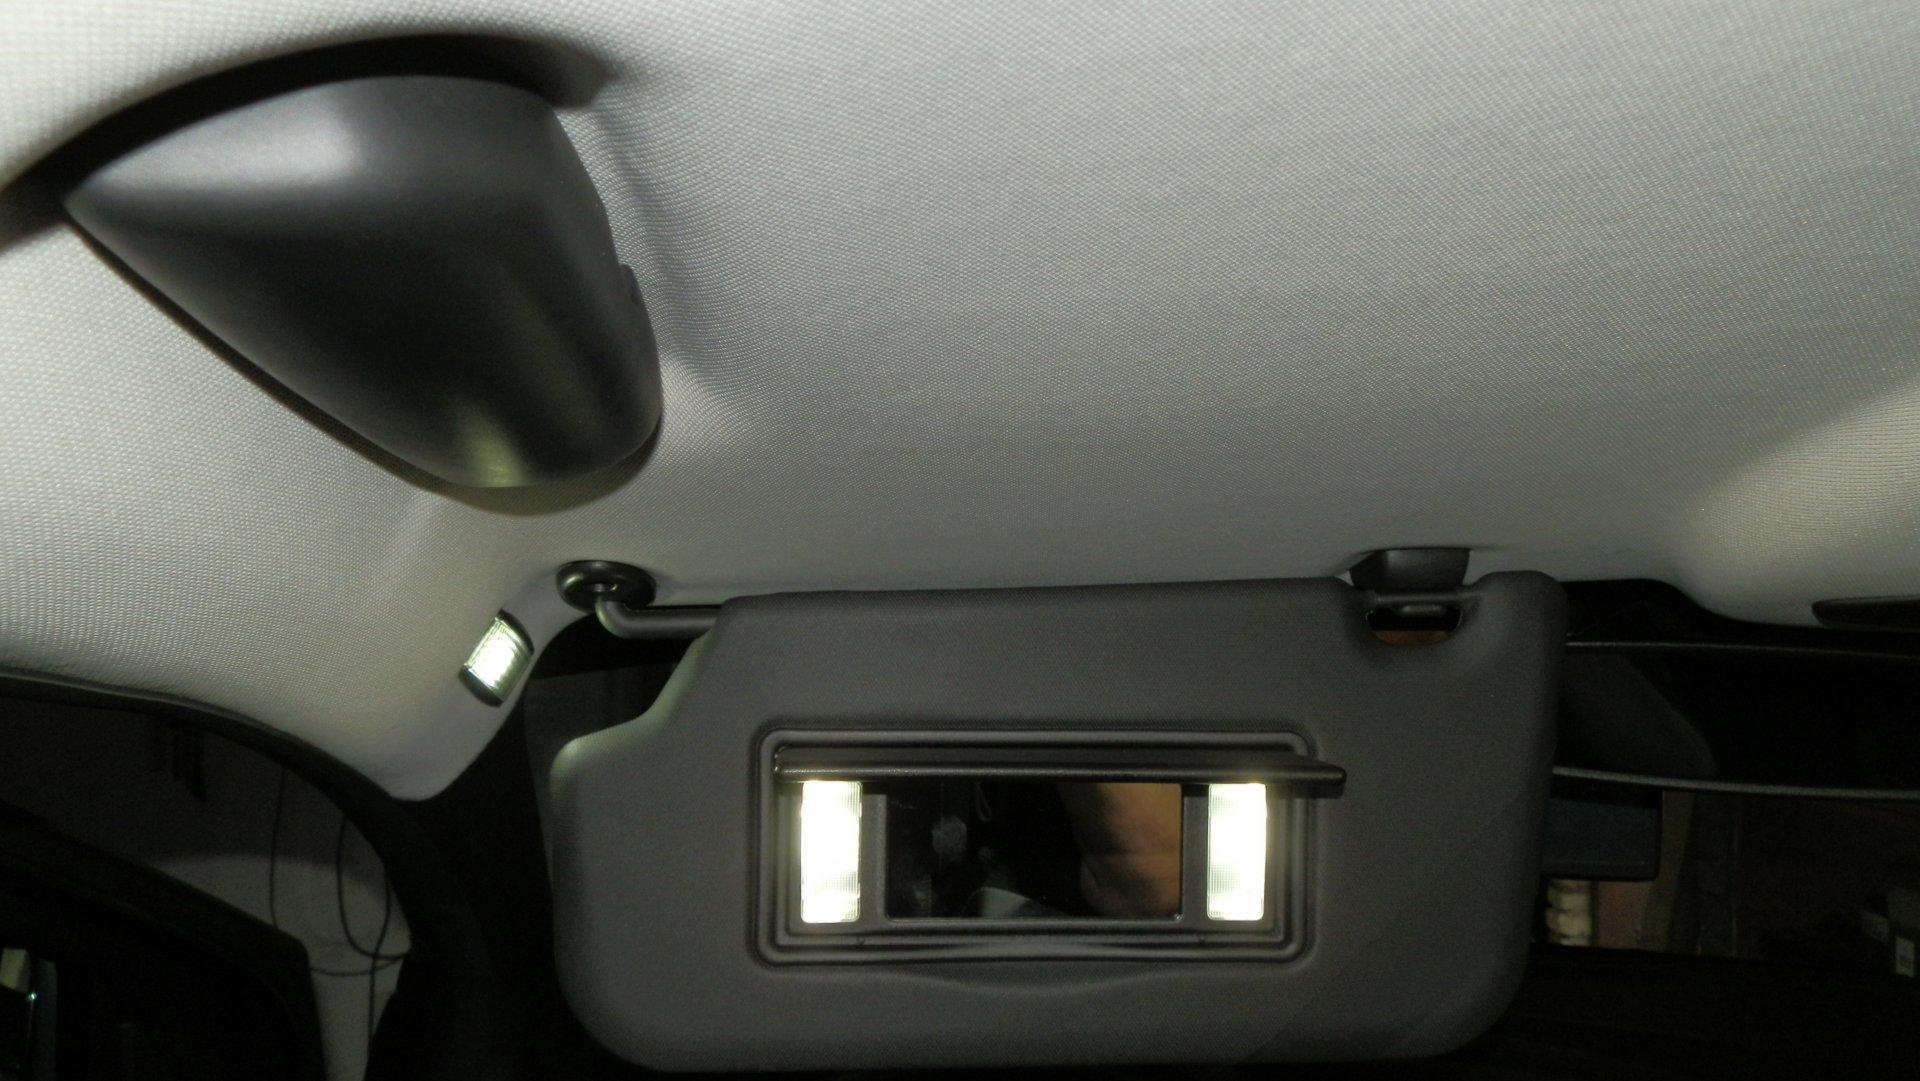 Ford Focus III (2016-05-22) - LED-Make-up-Spiegel-Schminkspiegelbeleuchtung - Bild 7.JPG